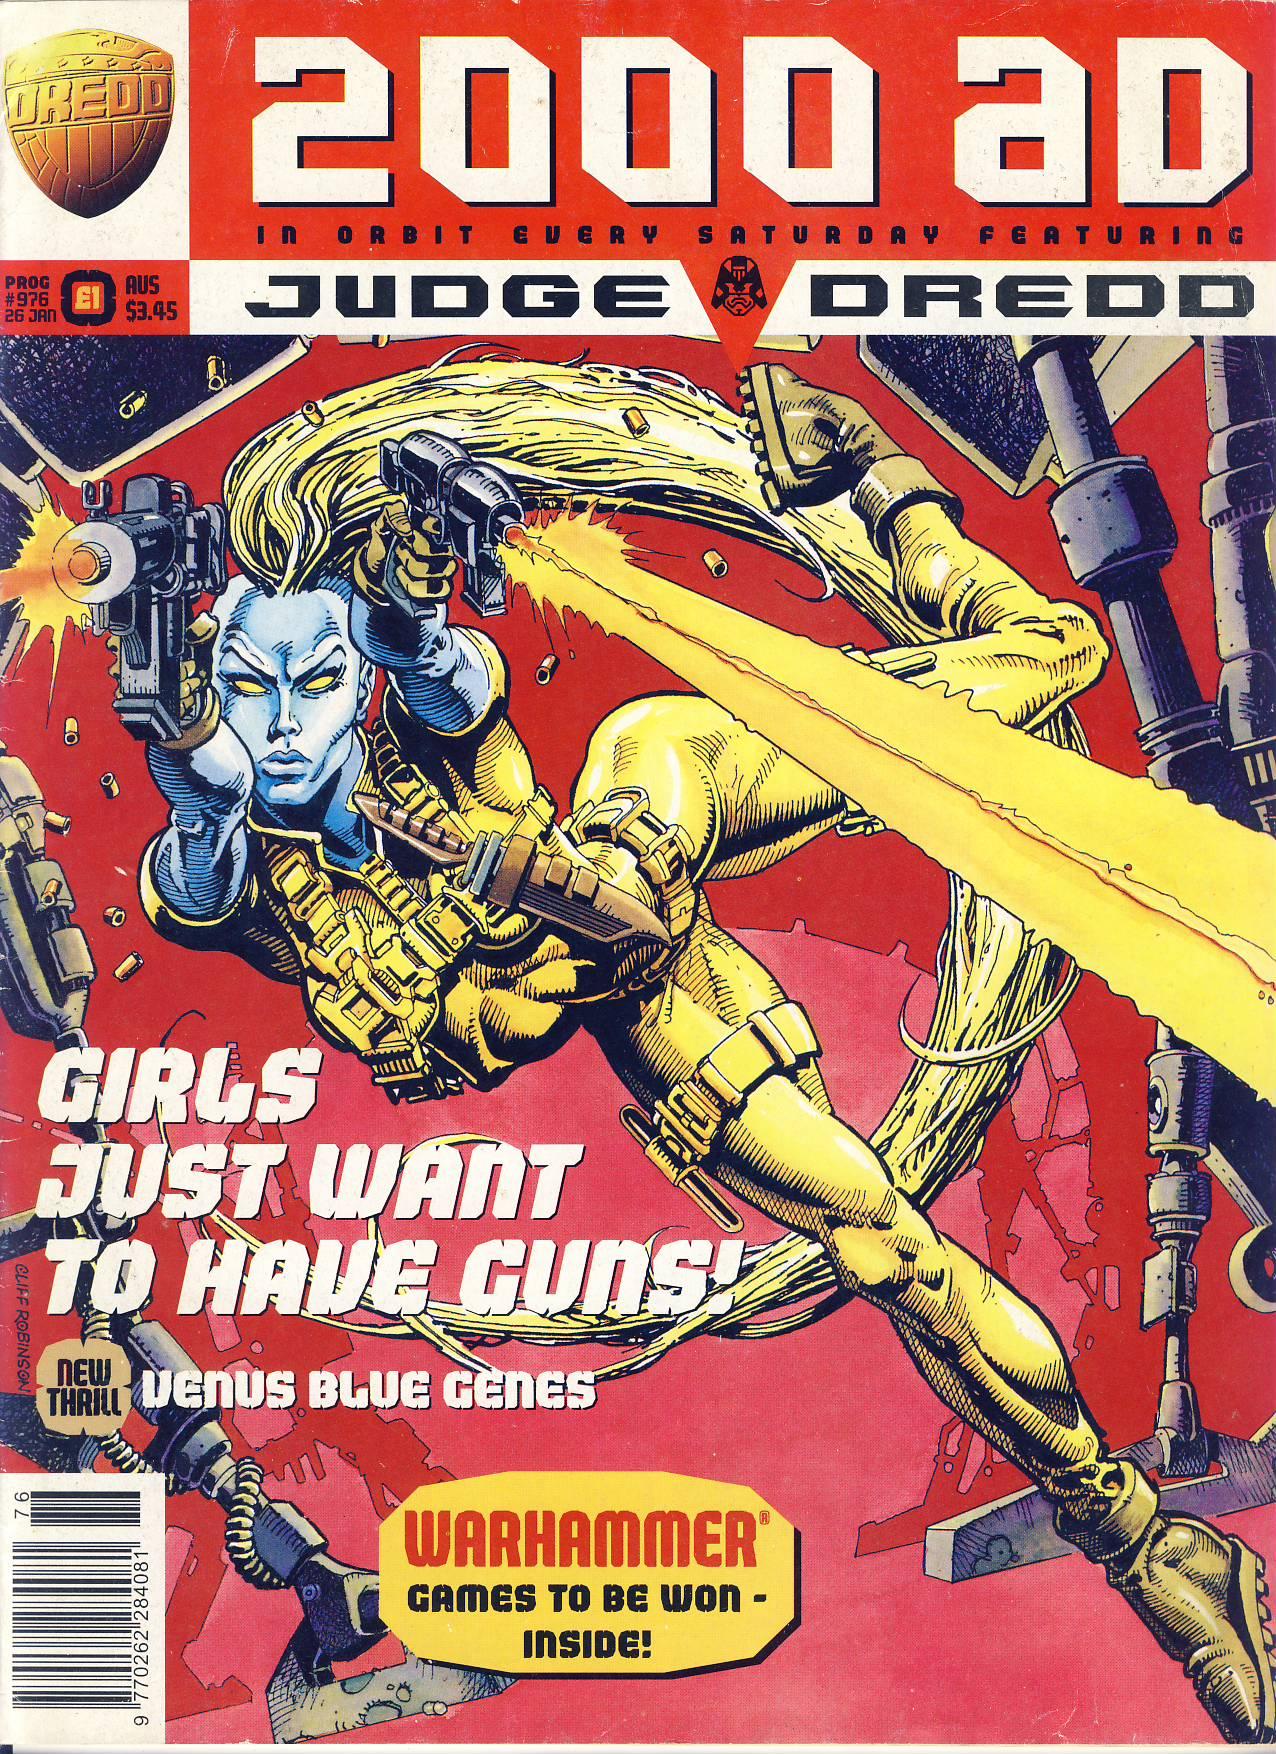 JOB LOT 2000 AD Judge Dredd - 5 comics no.976 no.975 no.988 no.603 no.580 ref101723-8  pre-owned items in well read condition. Please read full description and see photos.